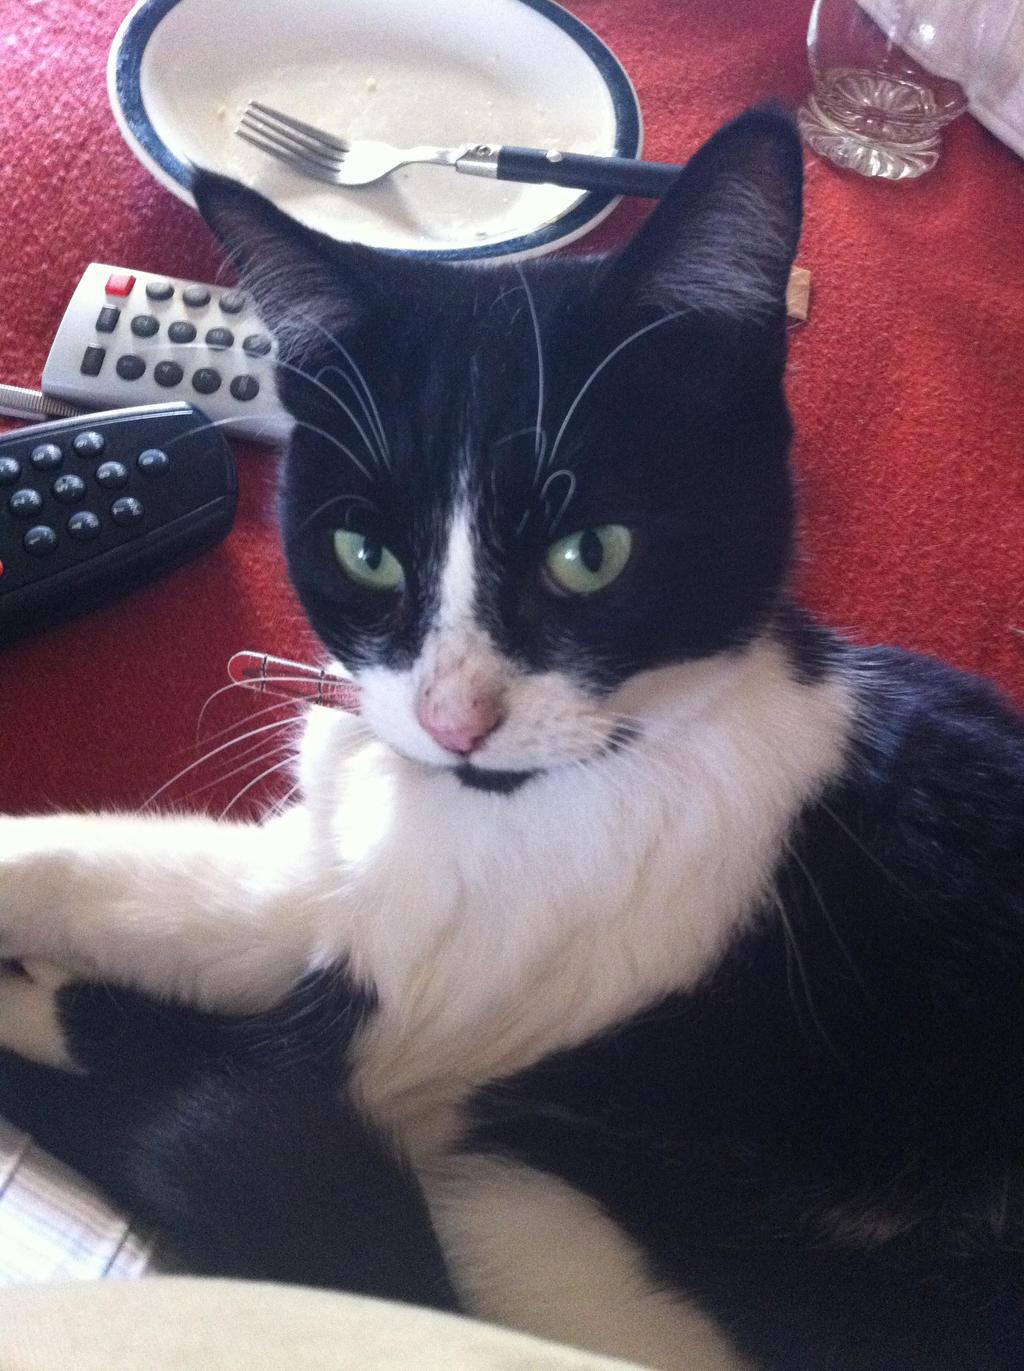 My cat - Nala by kazza-spexy